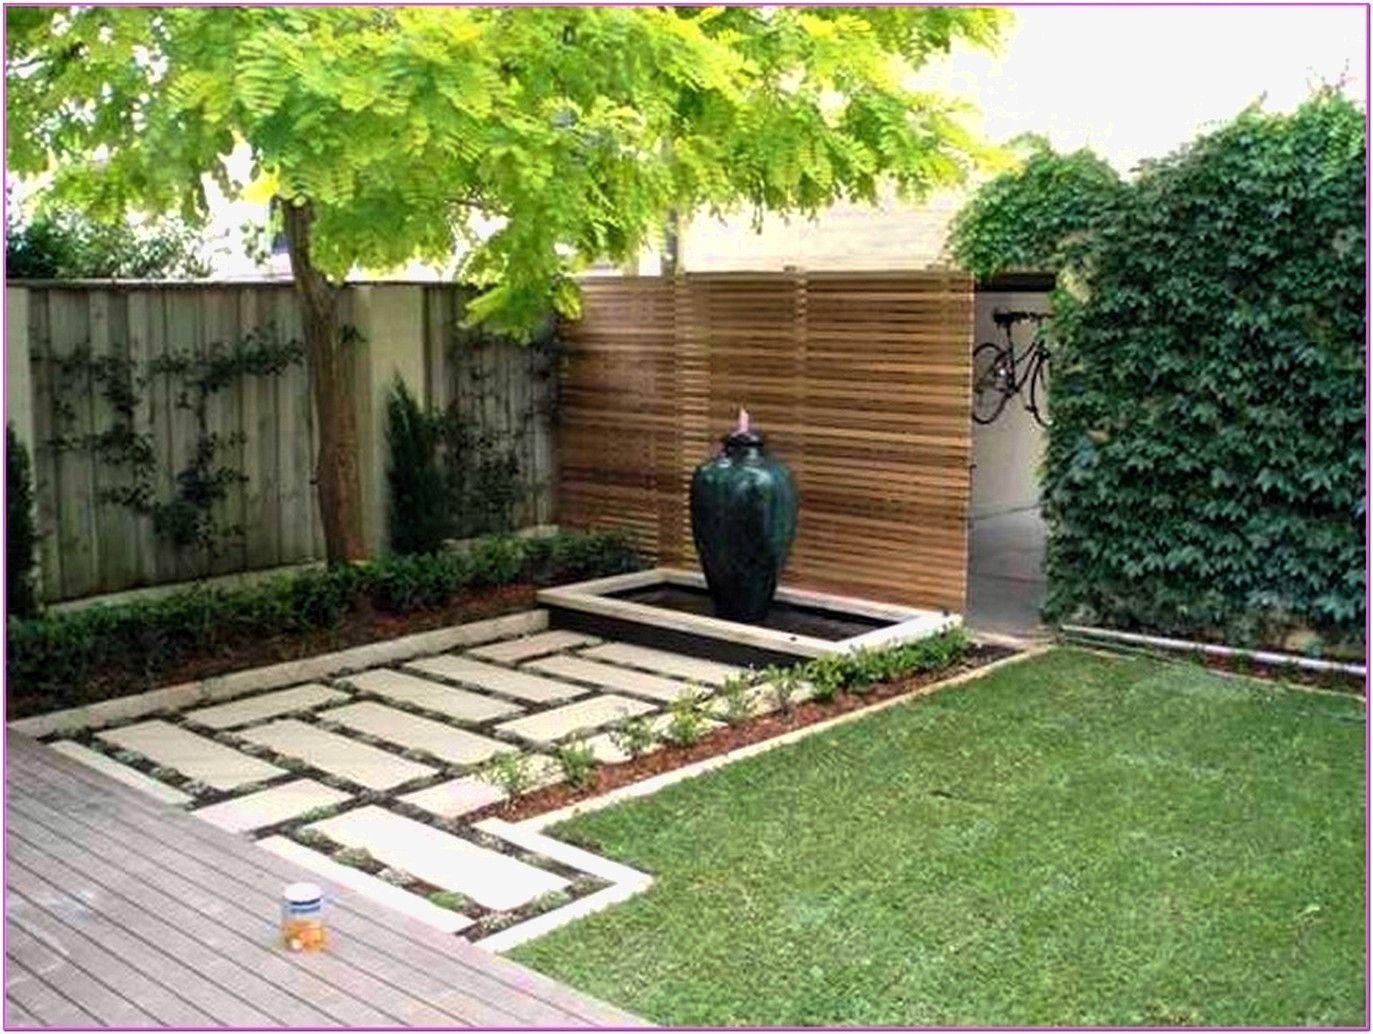 backyard backyard landscape ideas cheap - Small Backyard Design Ideas On A Budget